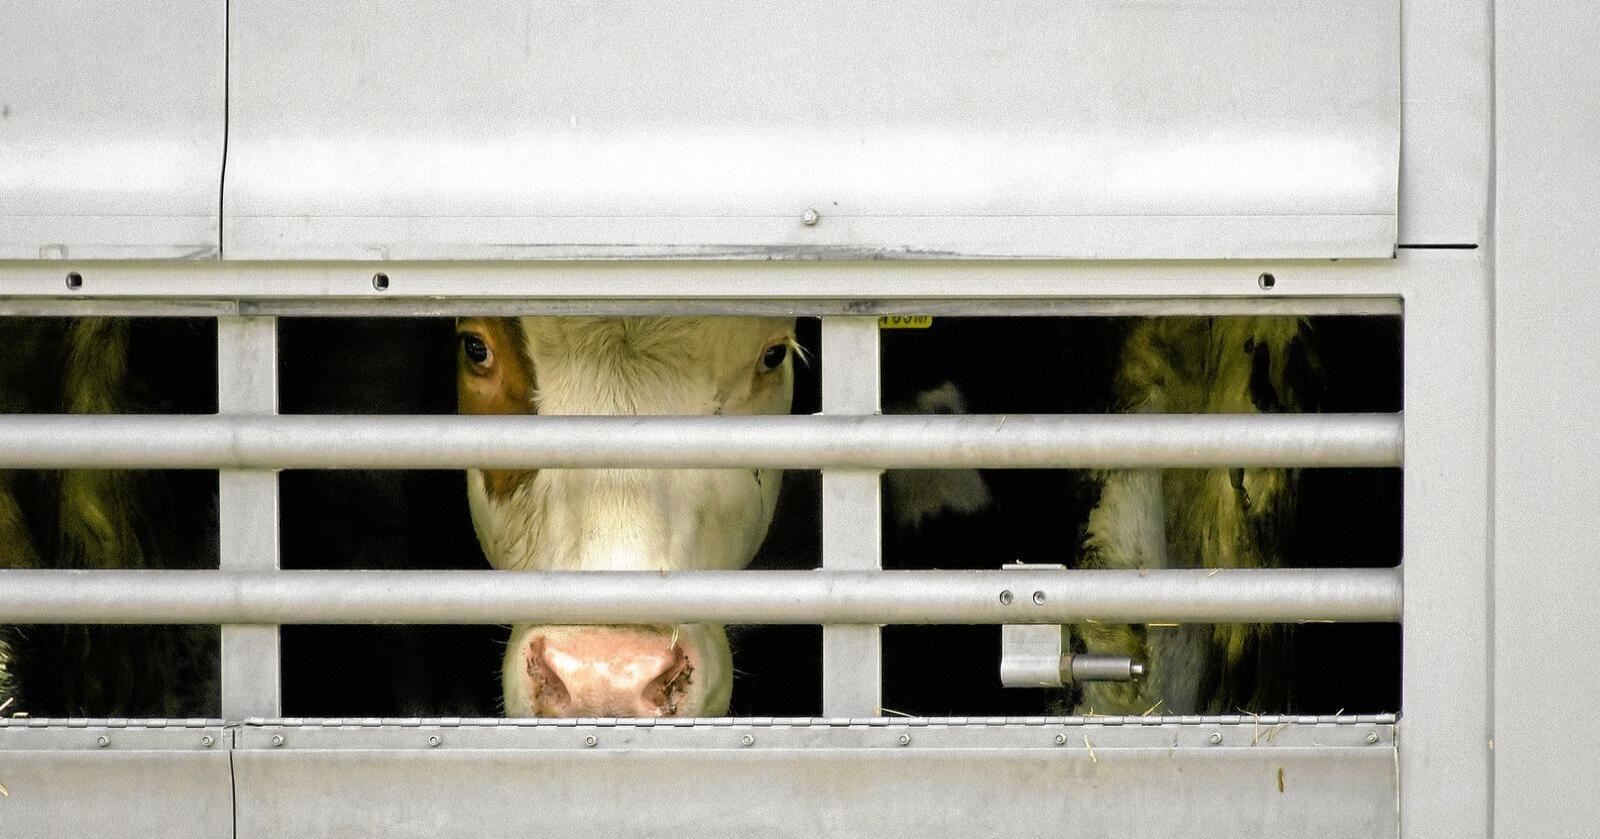 Hver dag blir fem millioner dyr transportert rundt omkring i verden. Foto: Richard Schramm / Mostphotos